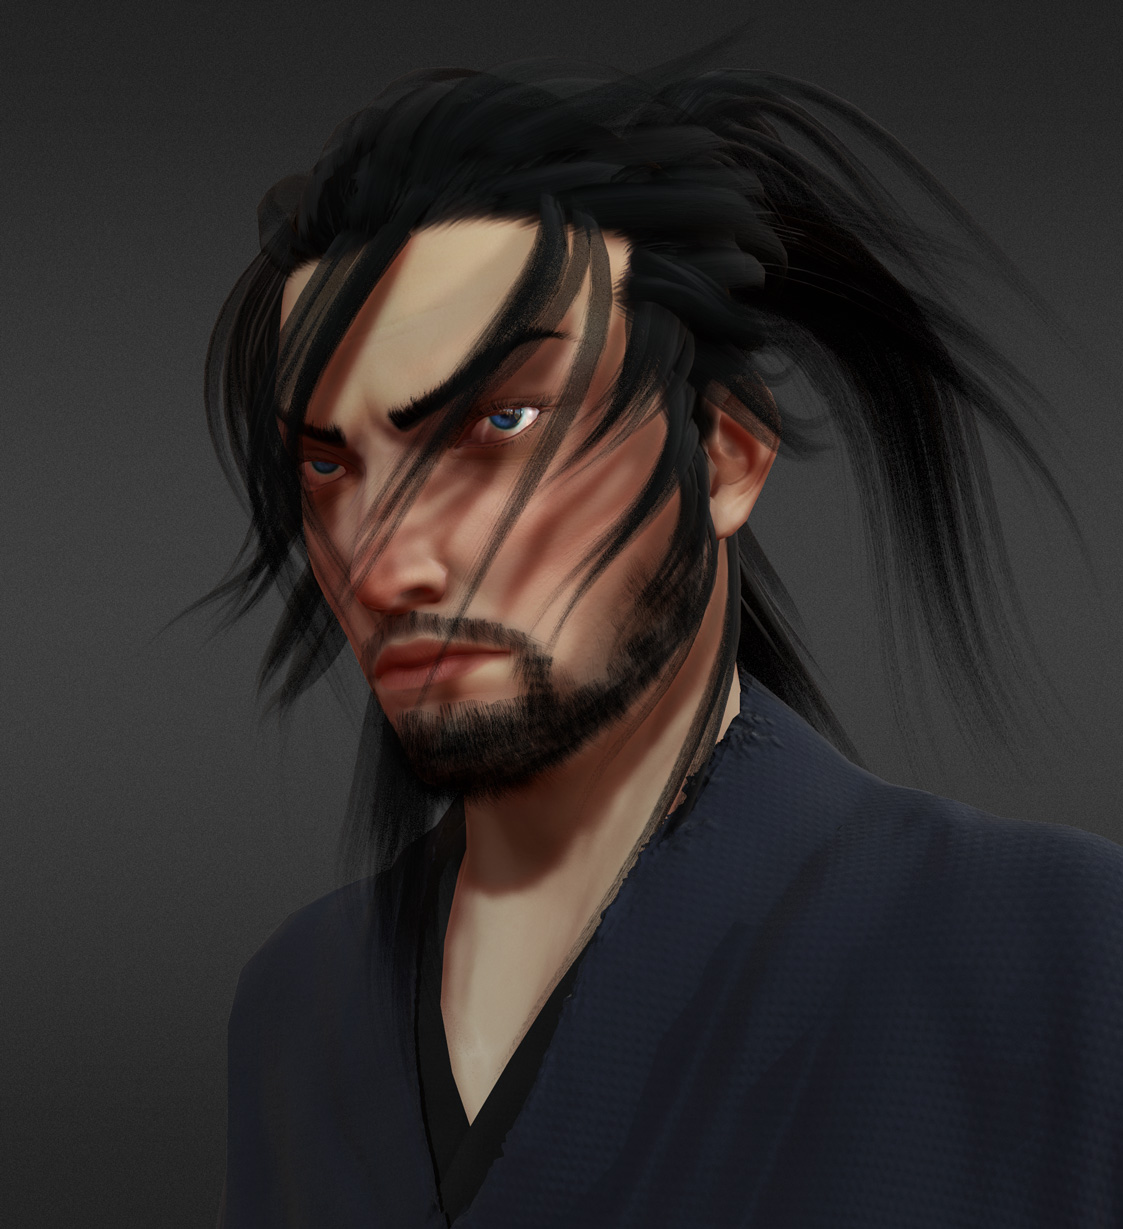 Miyamoto Musashi: What Are You Working On? 2016